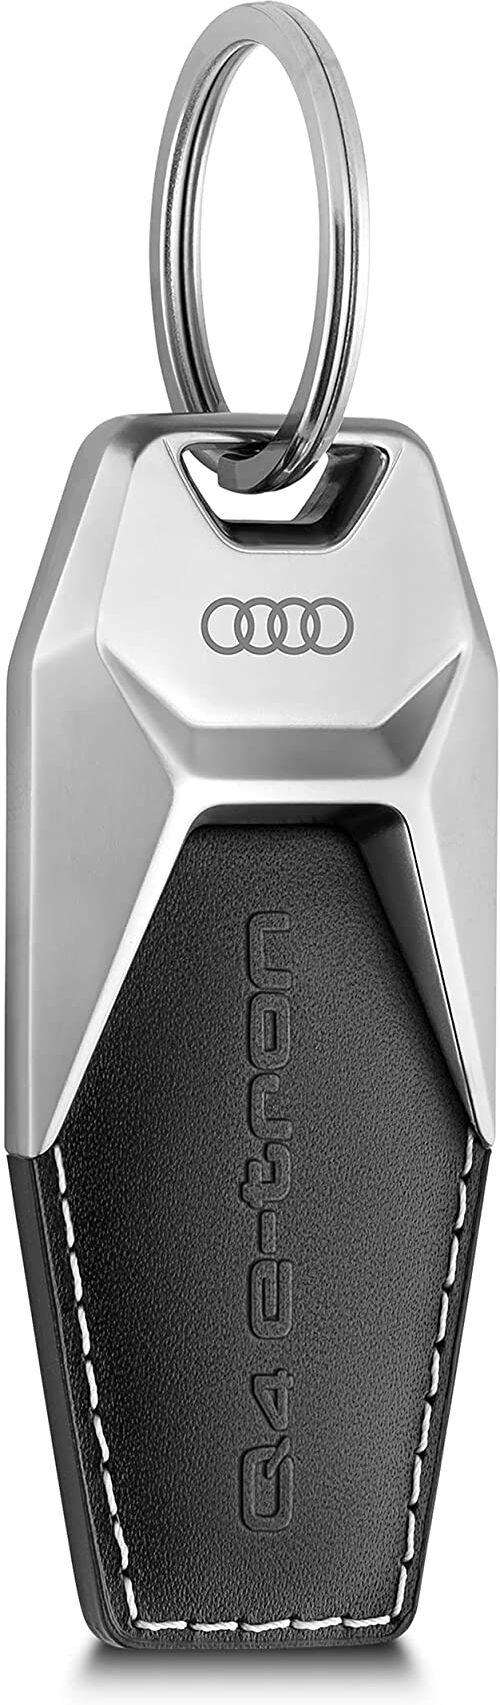 Audi 3182100301 breloczek do kluczy Q4 e-tron metal skóra zawieszka Keyring grawerunek, czarny/srebrny